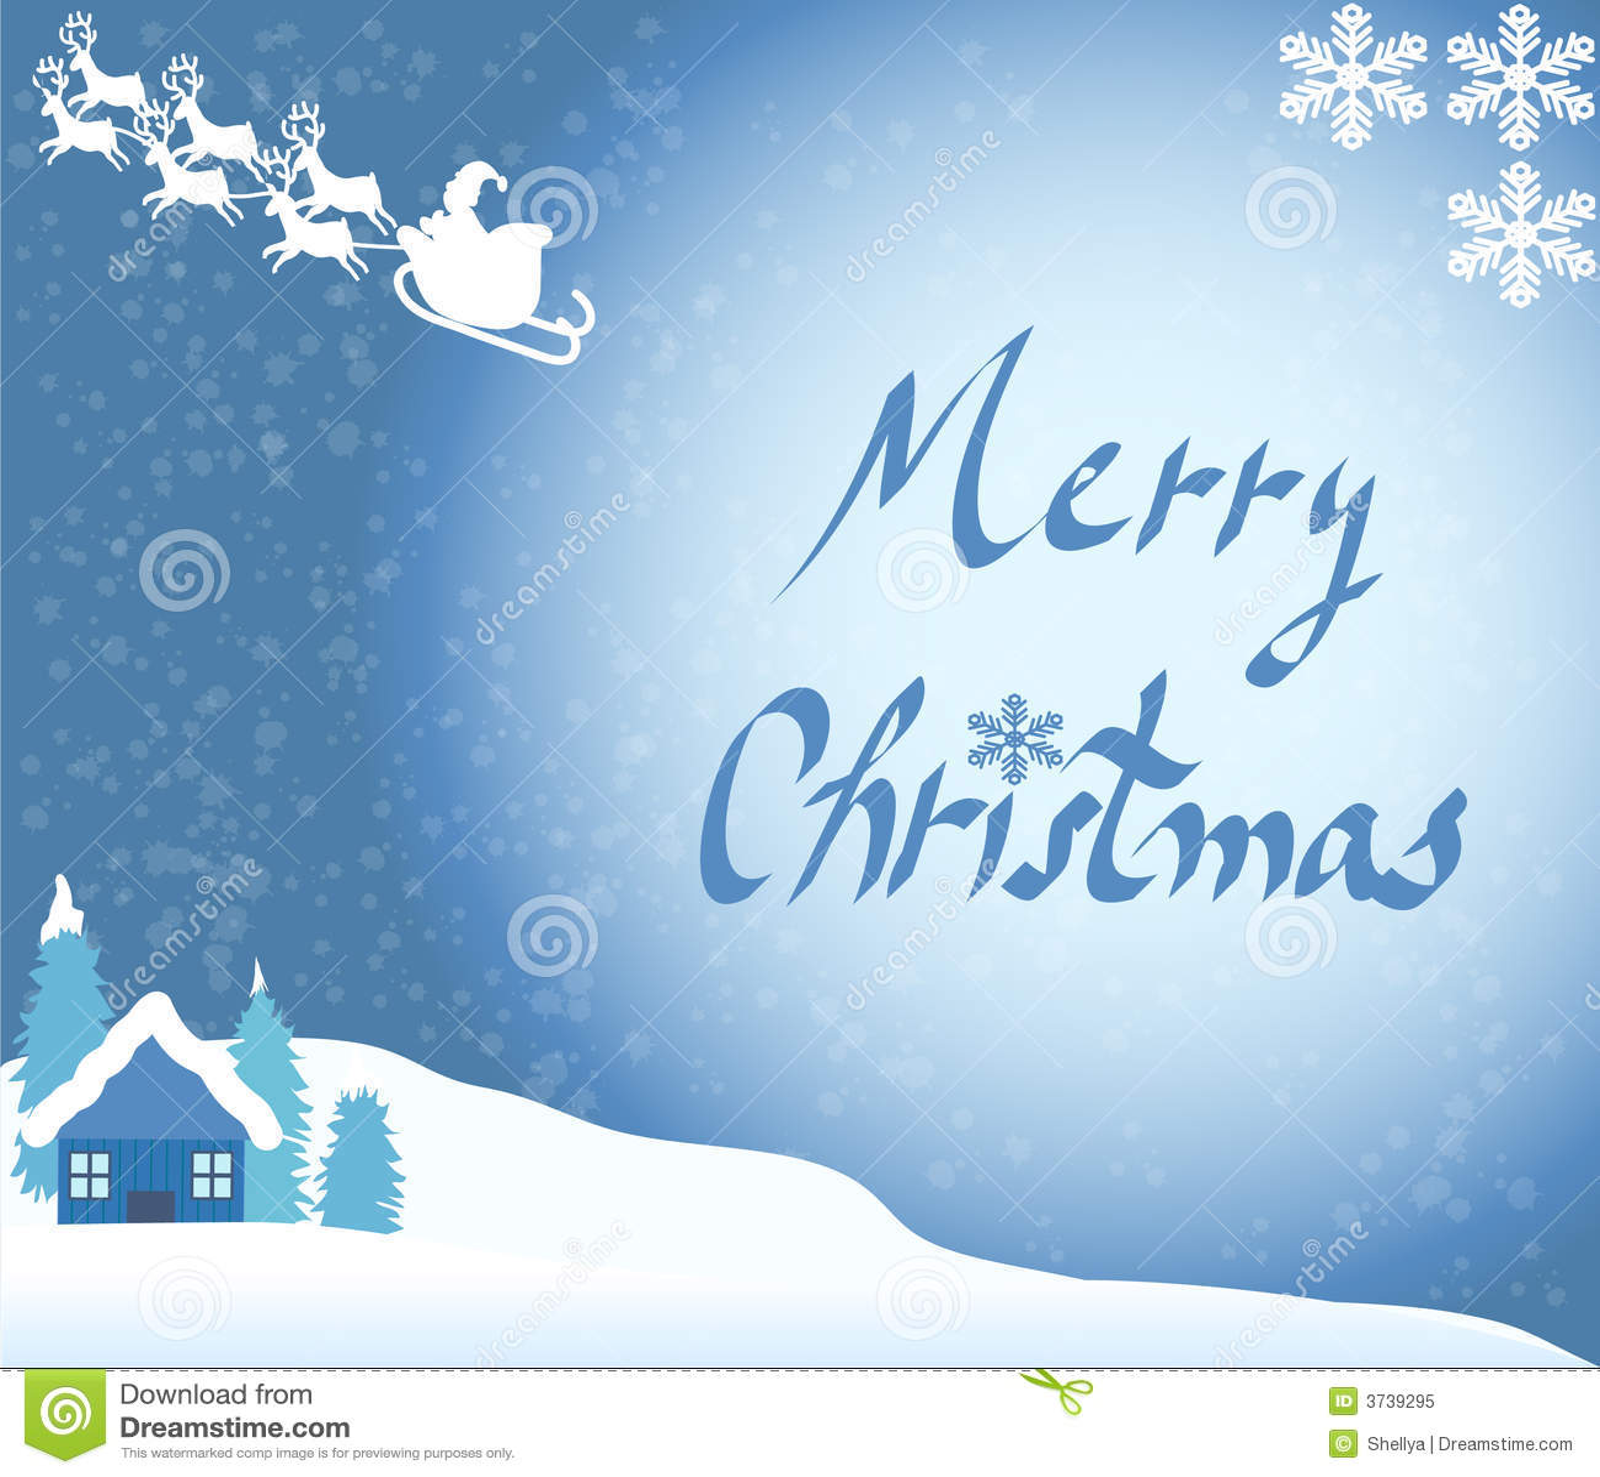 Christmas cardsanta and snow stock illustration illustration of christmas cardsanta and snow m4hsunfo